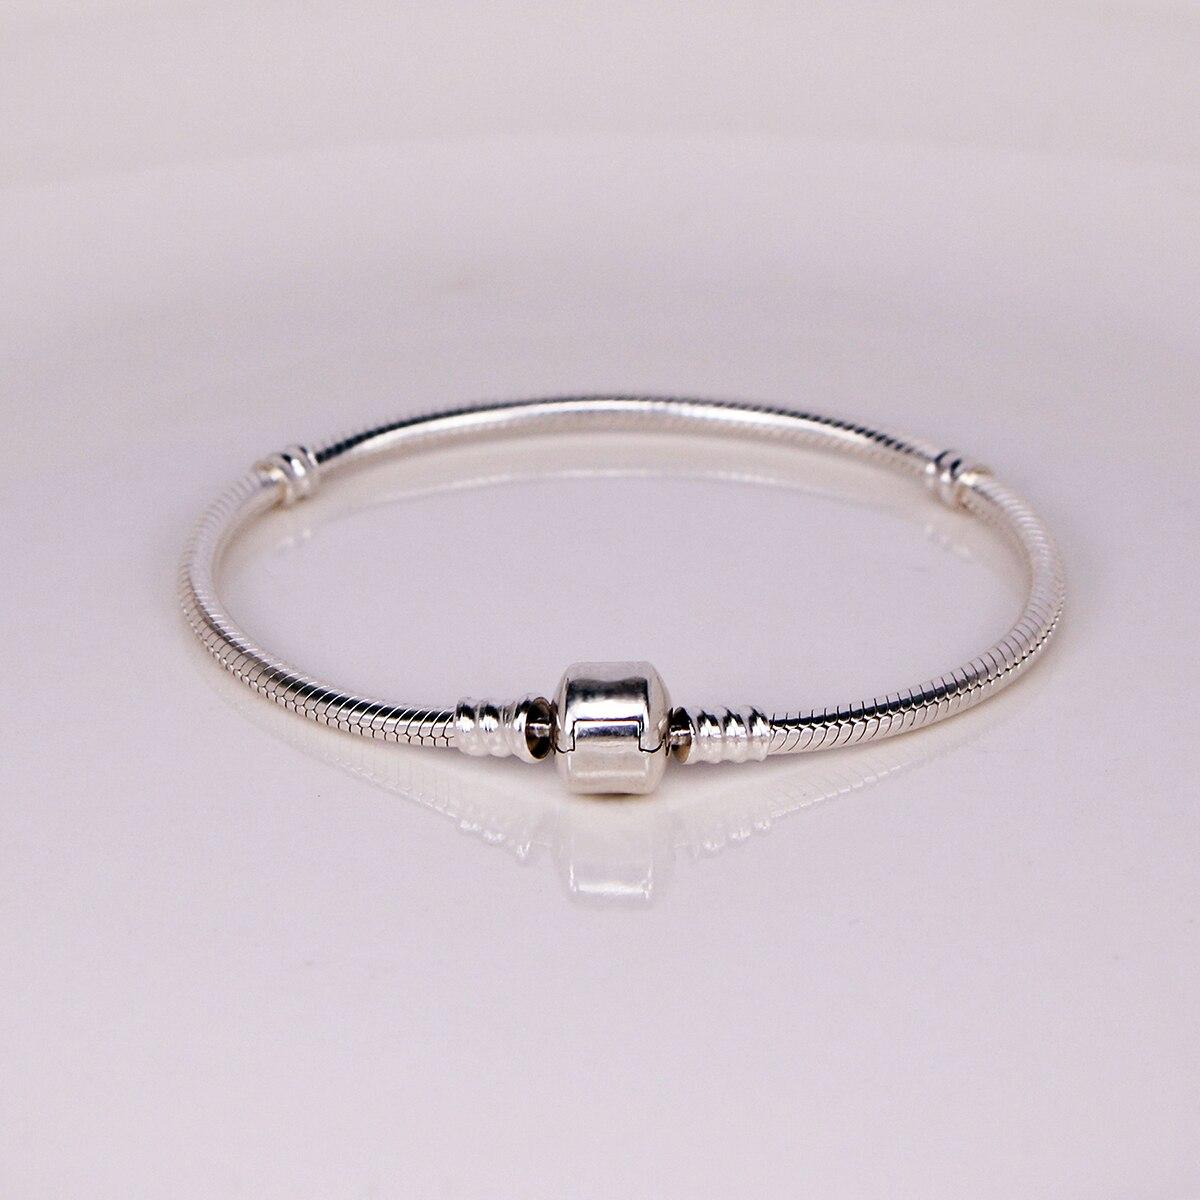 100% 925 sterling silver original classic charm for Pandora bracelet beads  as a Christmas gift